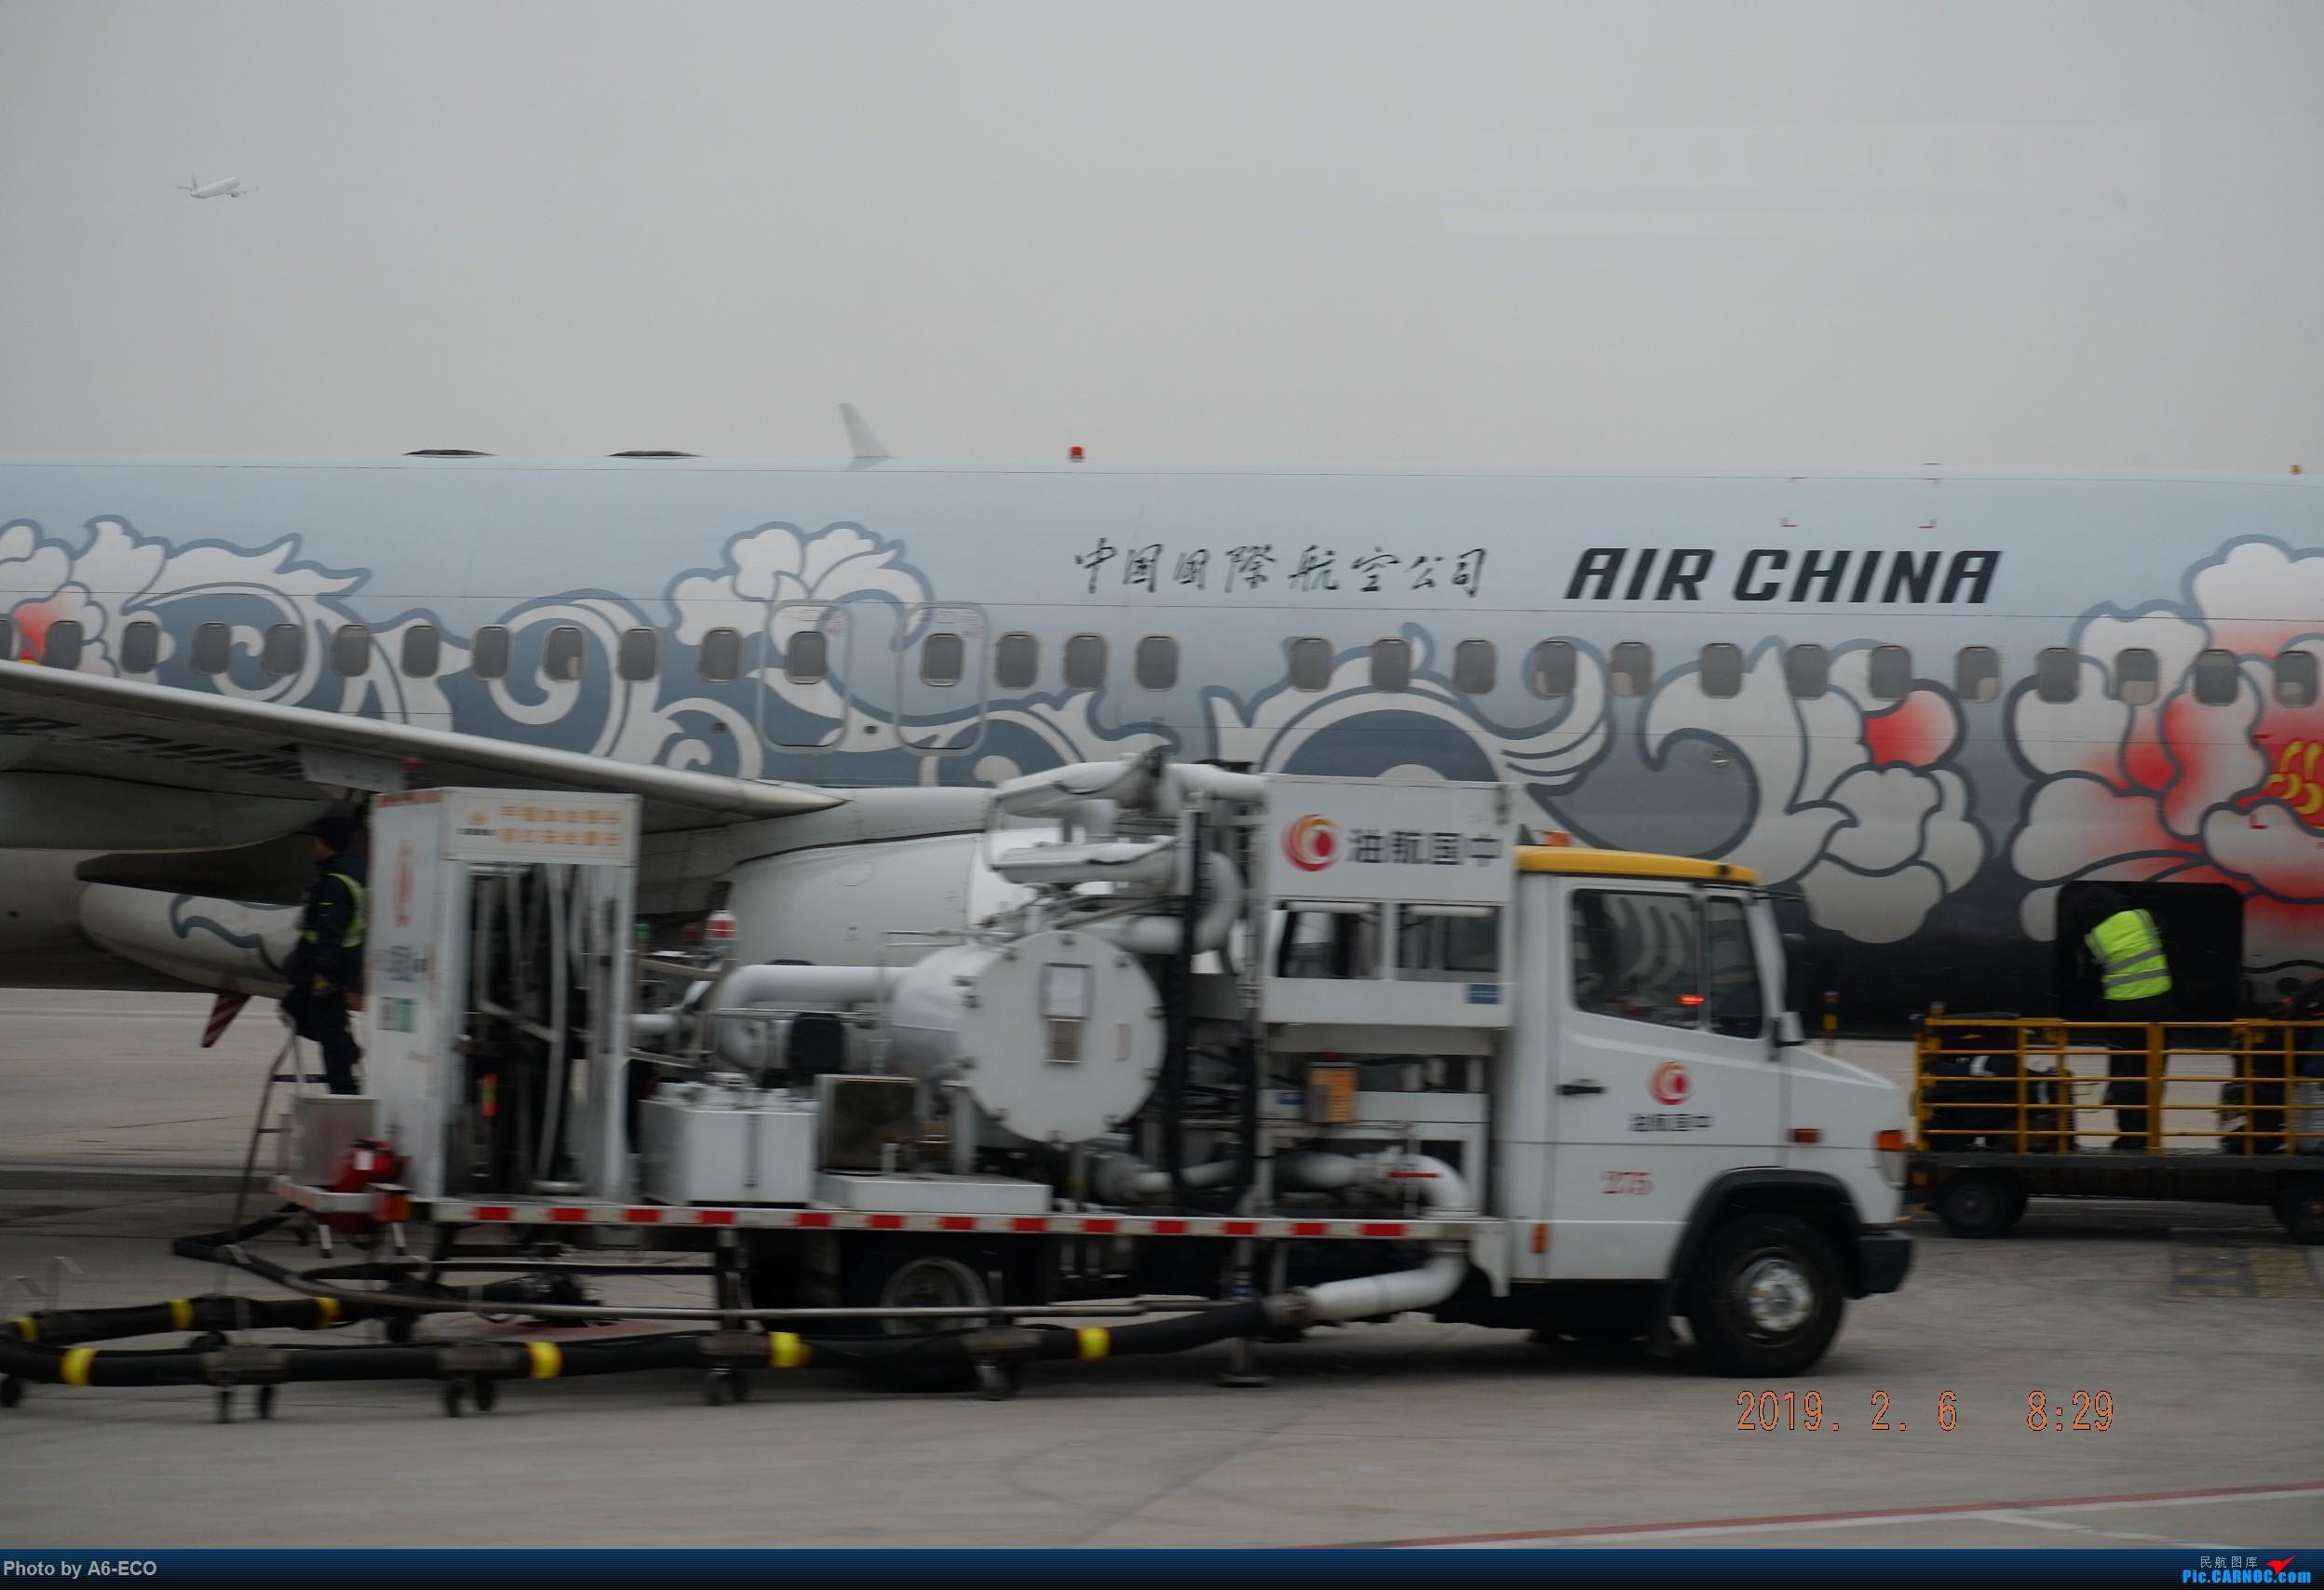 Re:[原创]#Siri旅行003#pek-nrt,繁华的东京 BOEING 737-800 B-5176 中国北京首都国际机场